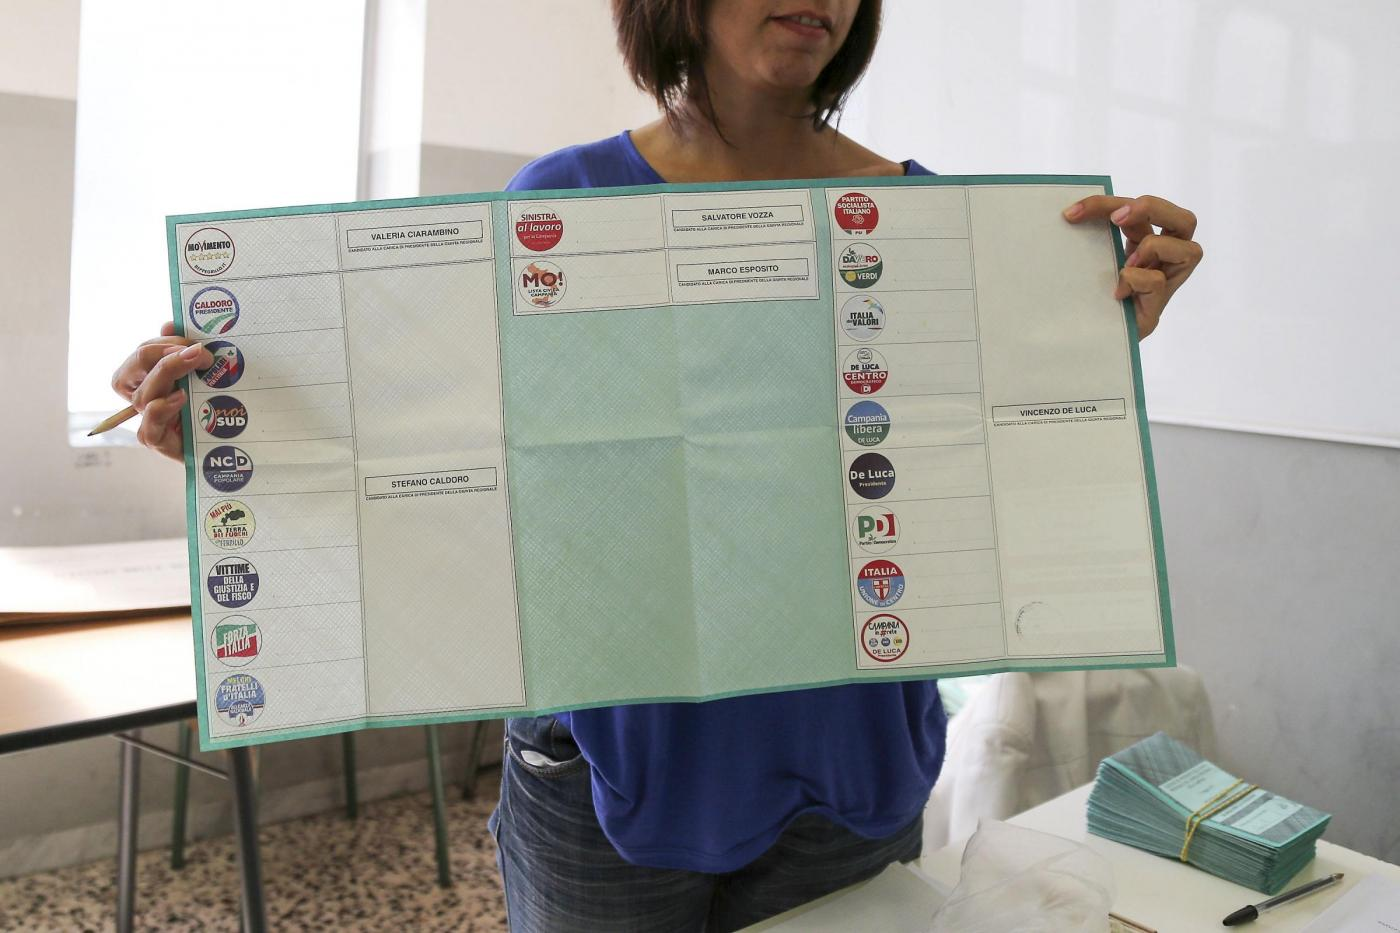 Elezioni regionali 2015: affluenza alle urne alle ore 23